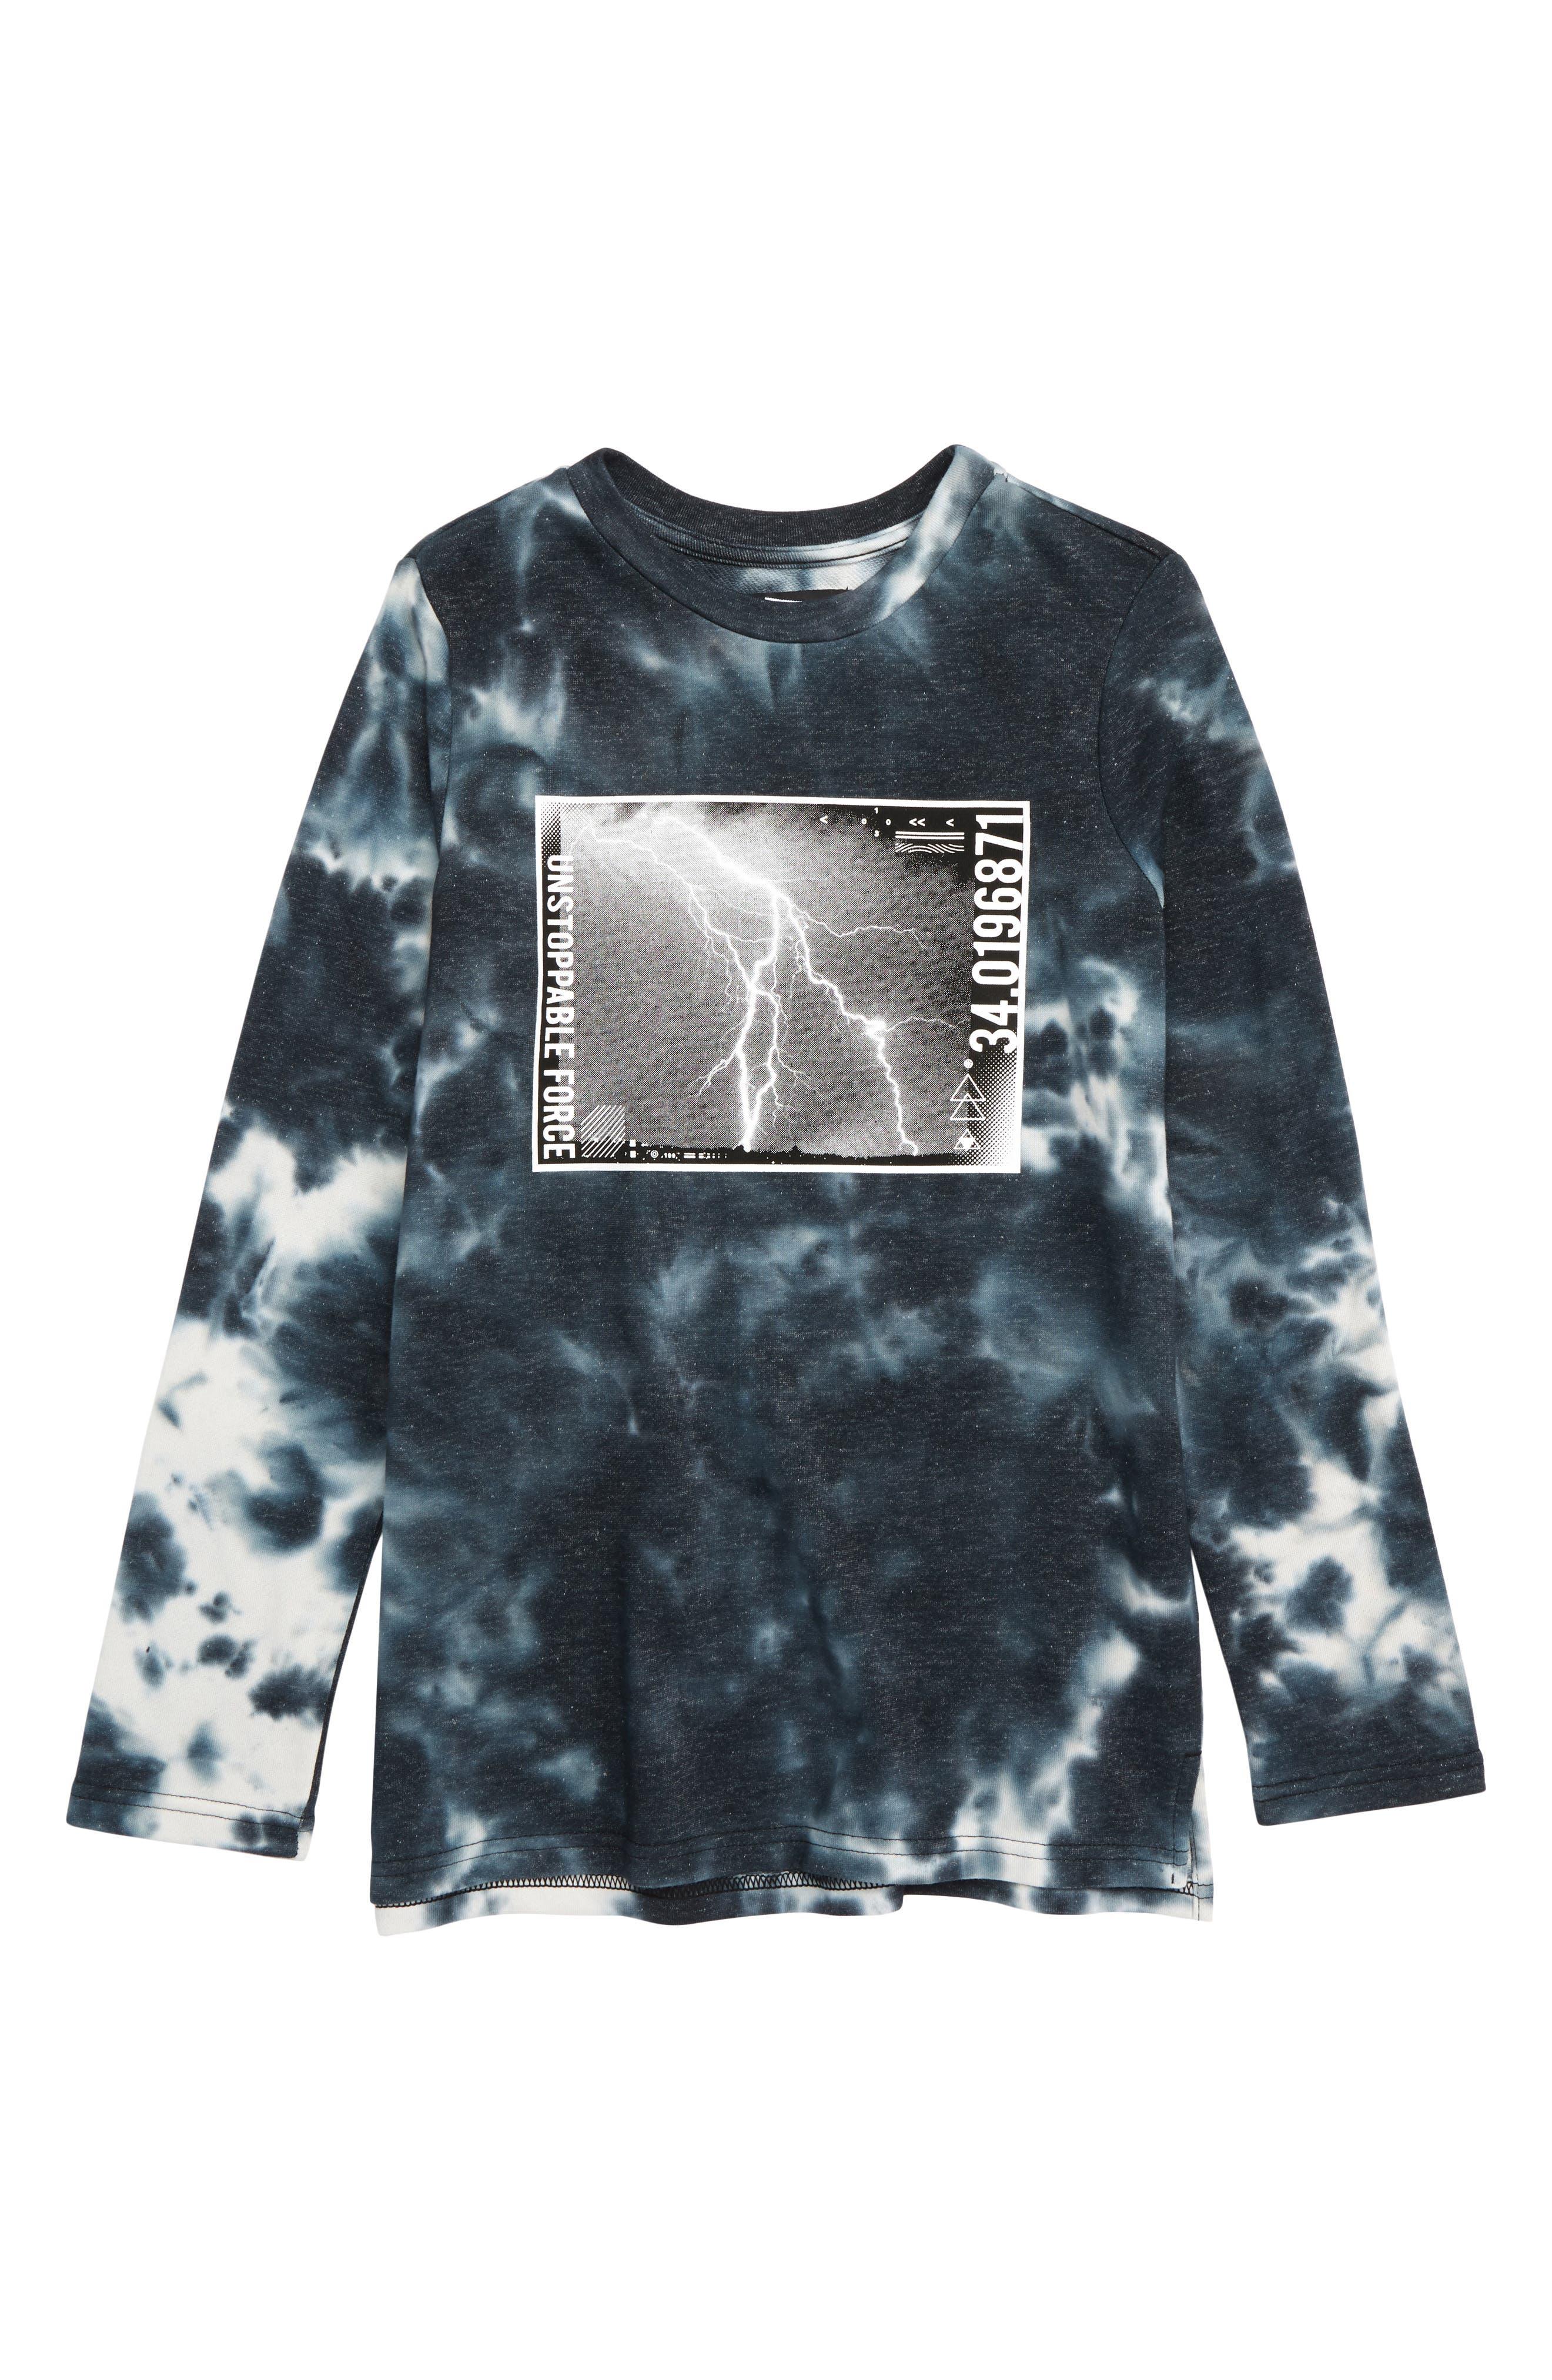 5TH AND RYDER,                             Lightning Graphic Long Sleeve T-Shirt,                             Main thumbnail 1, color,                             LIGHTNING BLACK/ WHITE TIEDYE